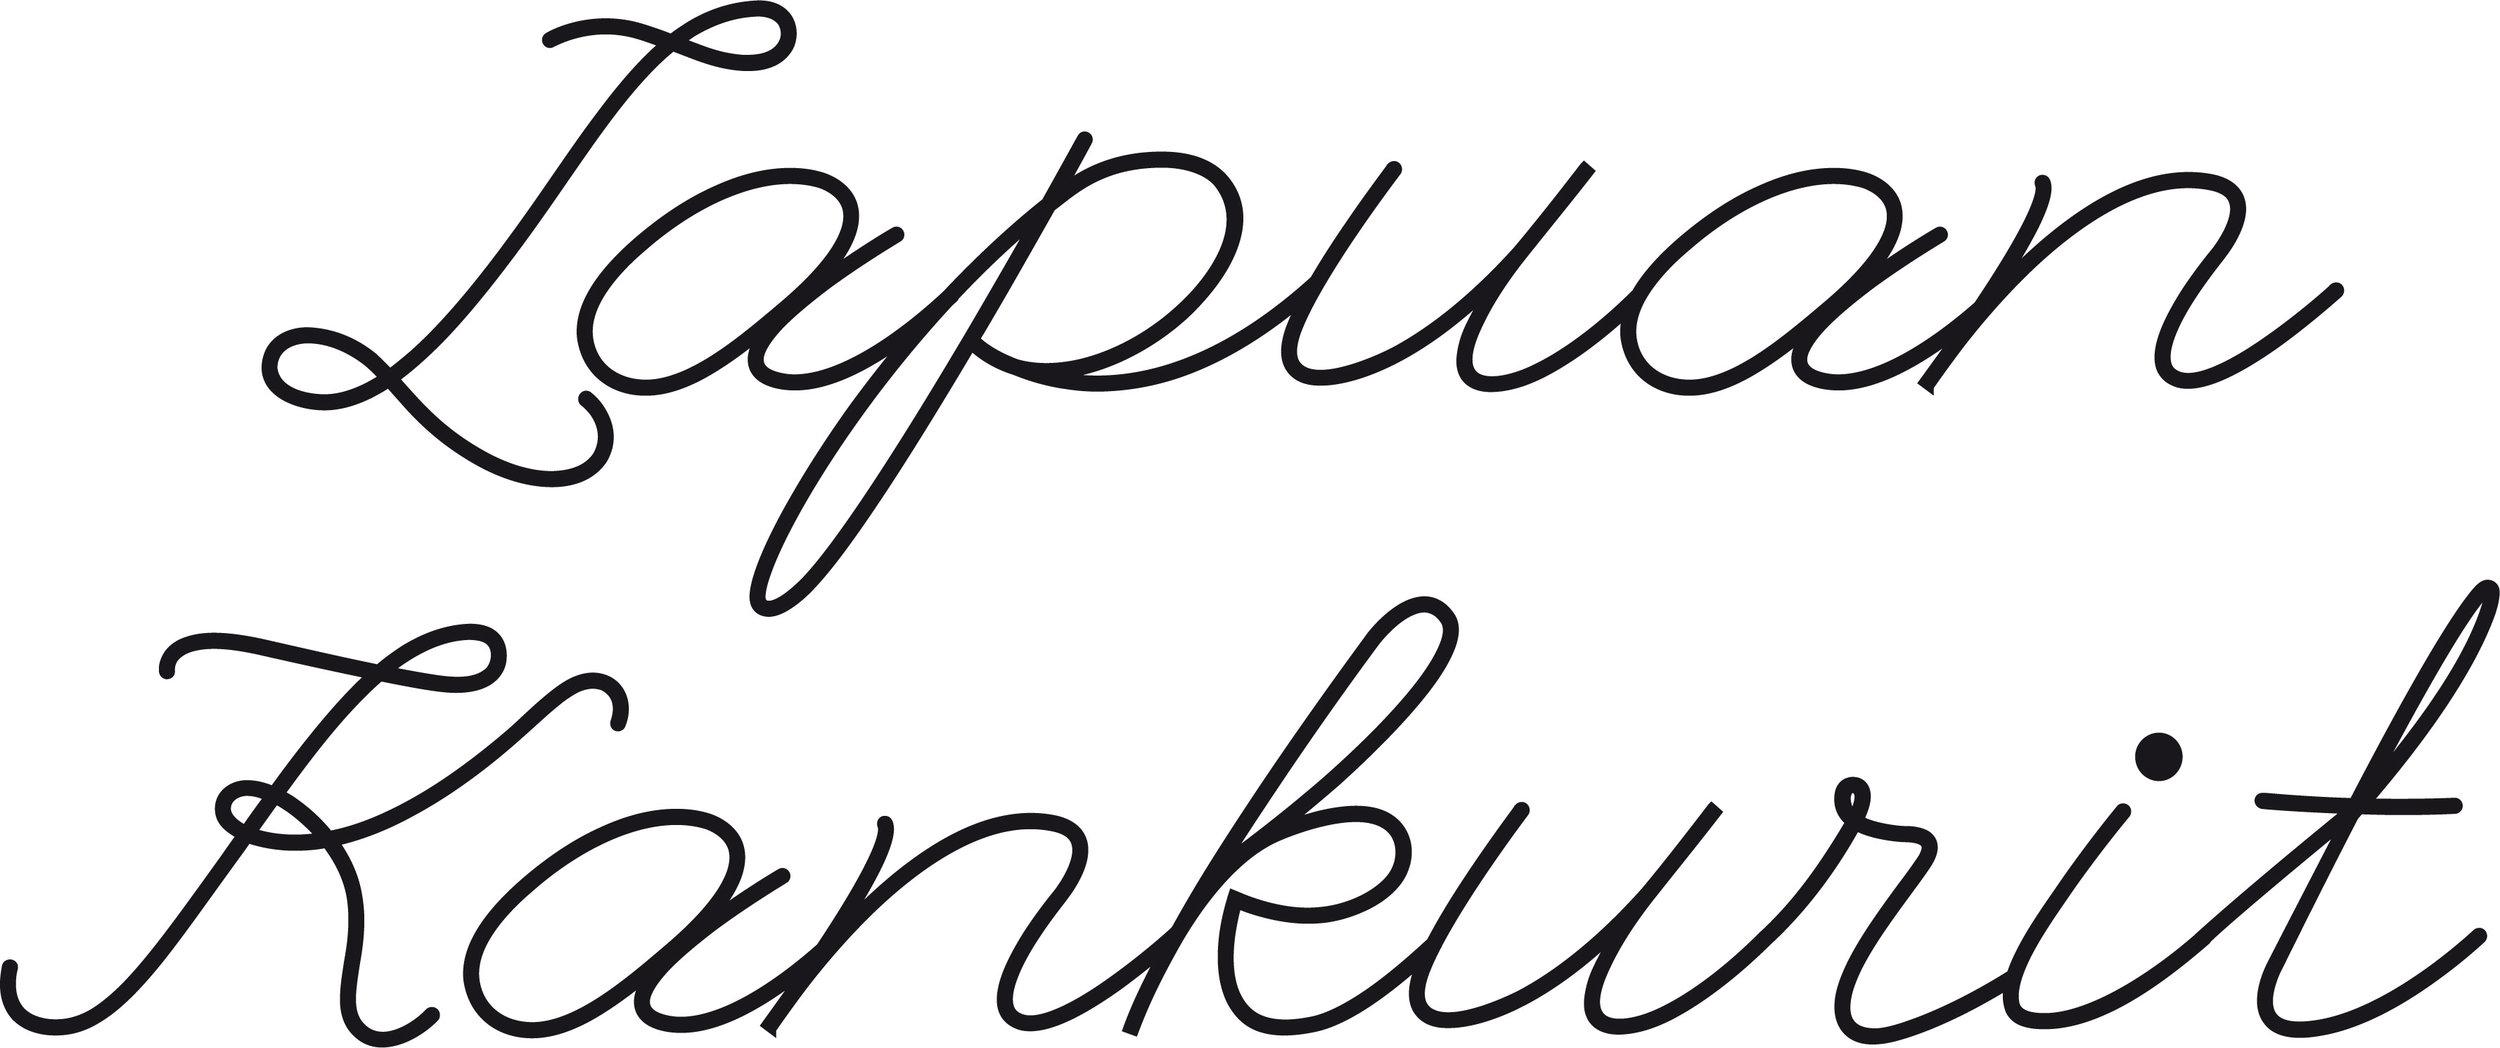 2_LapuanKankurit ScriptLogo_version2.jpg